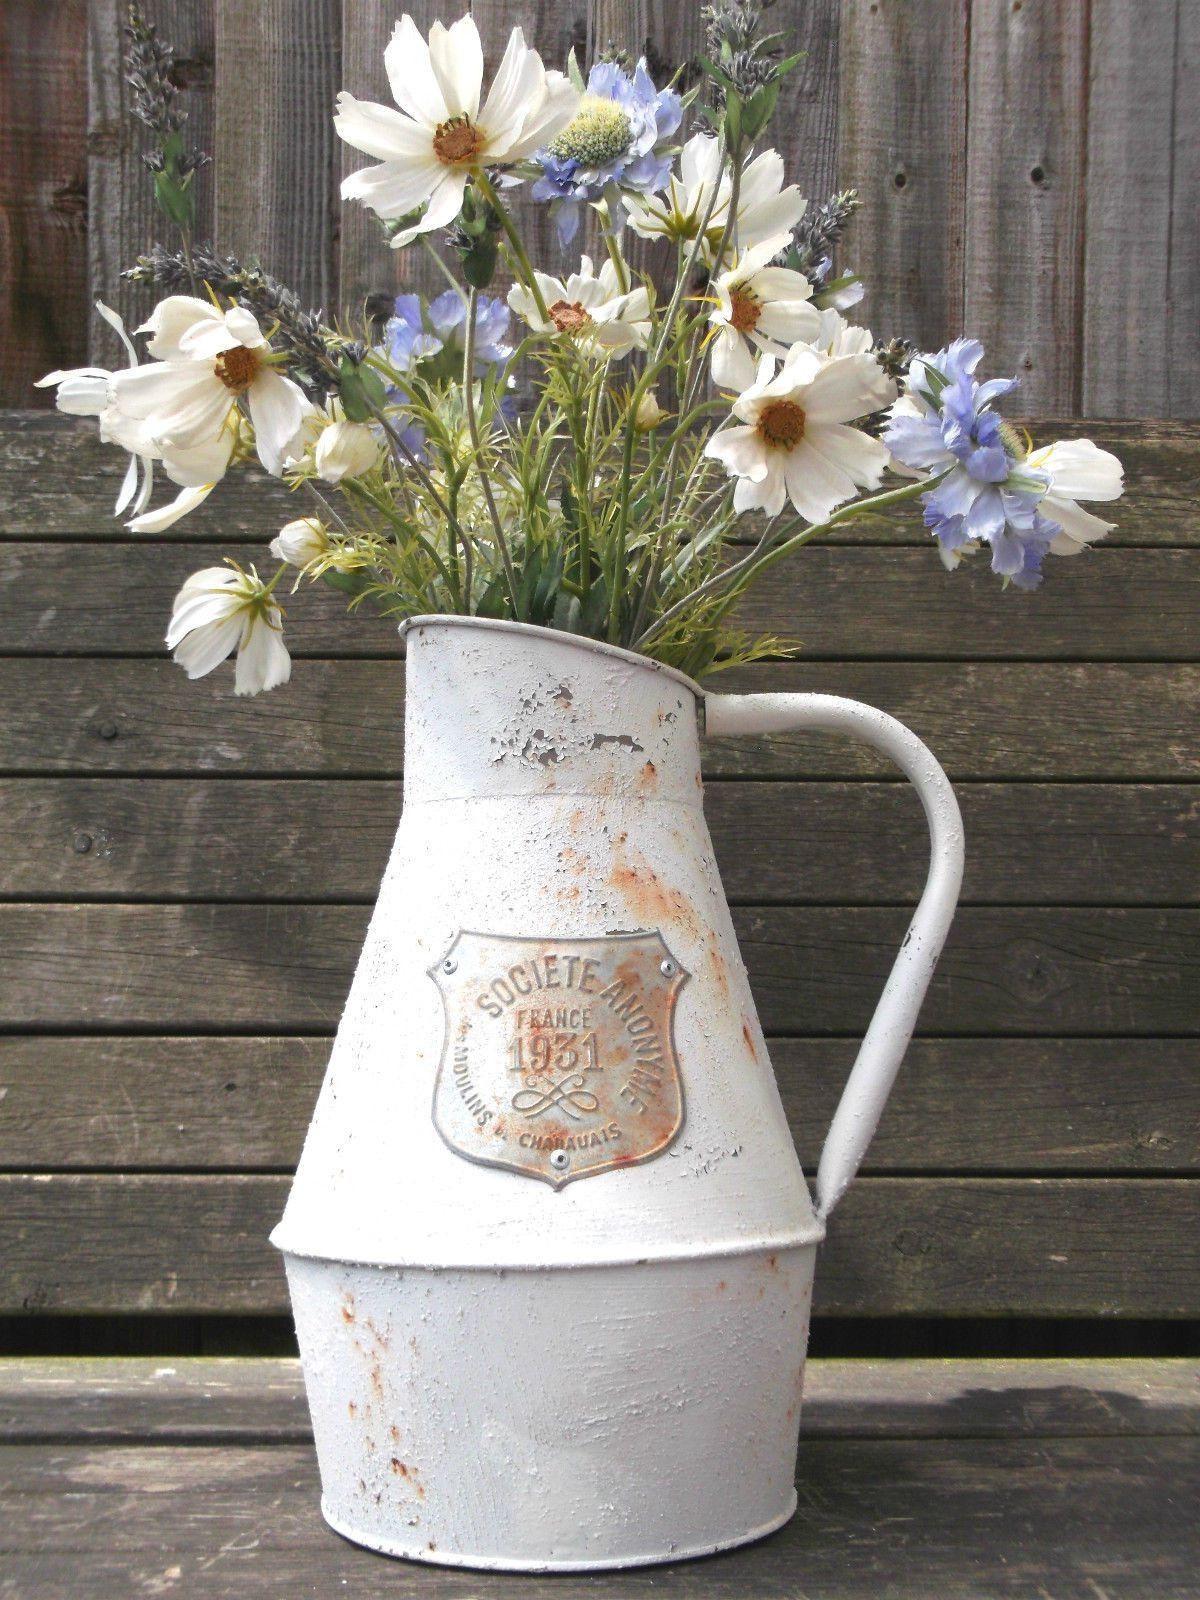 27 Lovable Decorative Wood Vase 2021 free download decorative wood vase of 30 copper flower vase the weekly world inside french flower bucket h vases galvanized french vase tin bucketi 0d